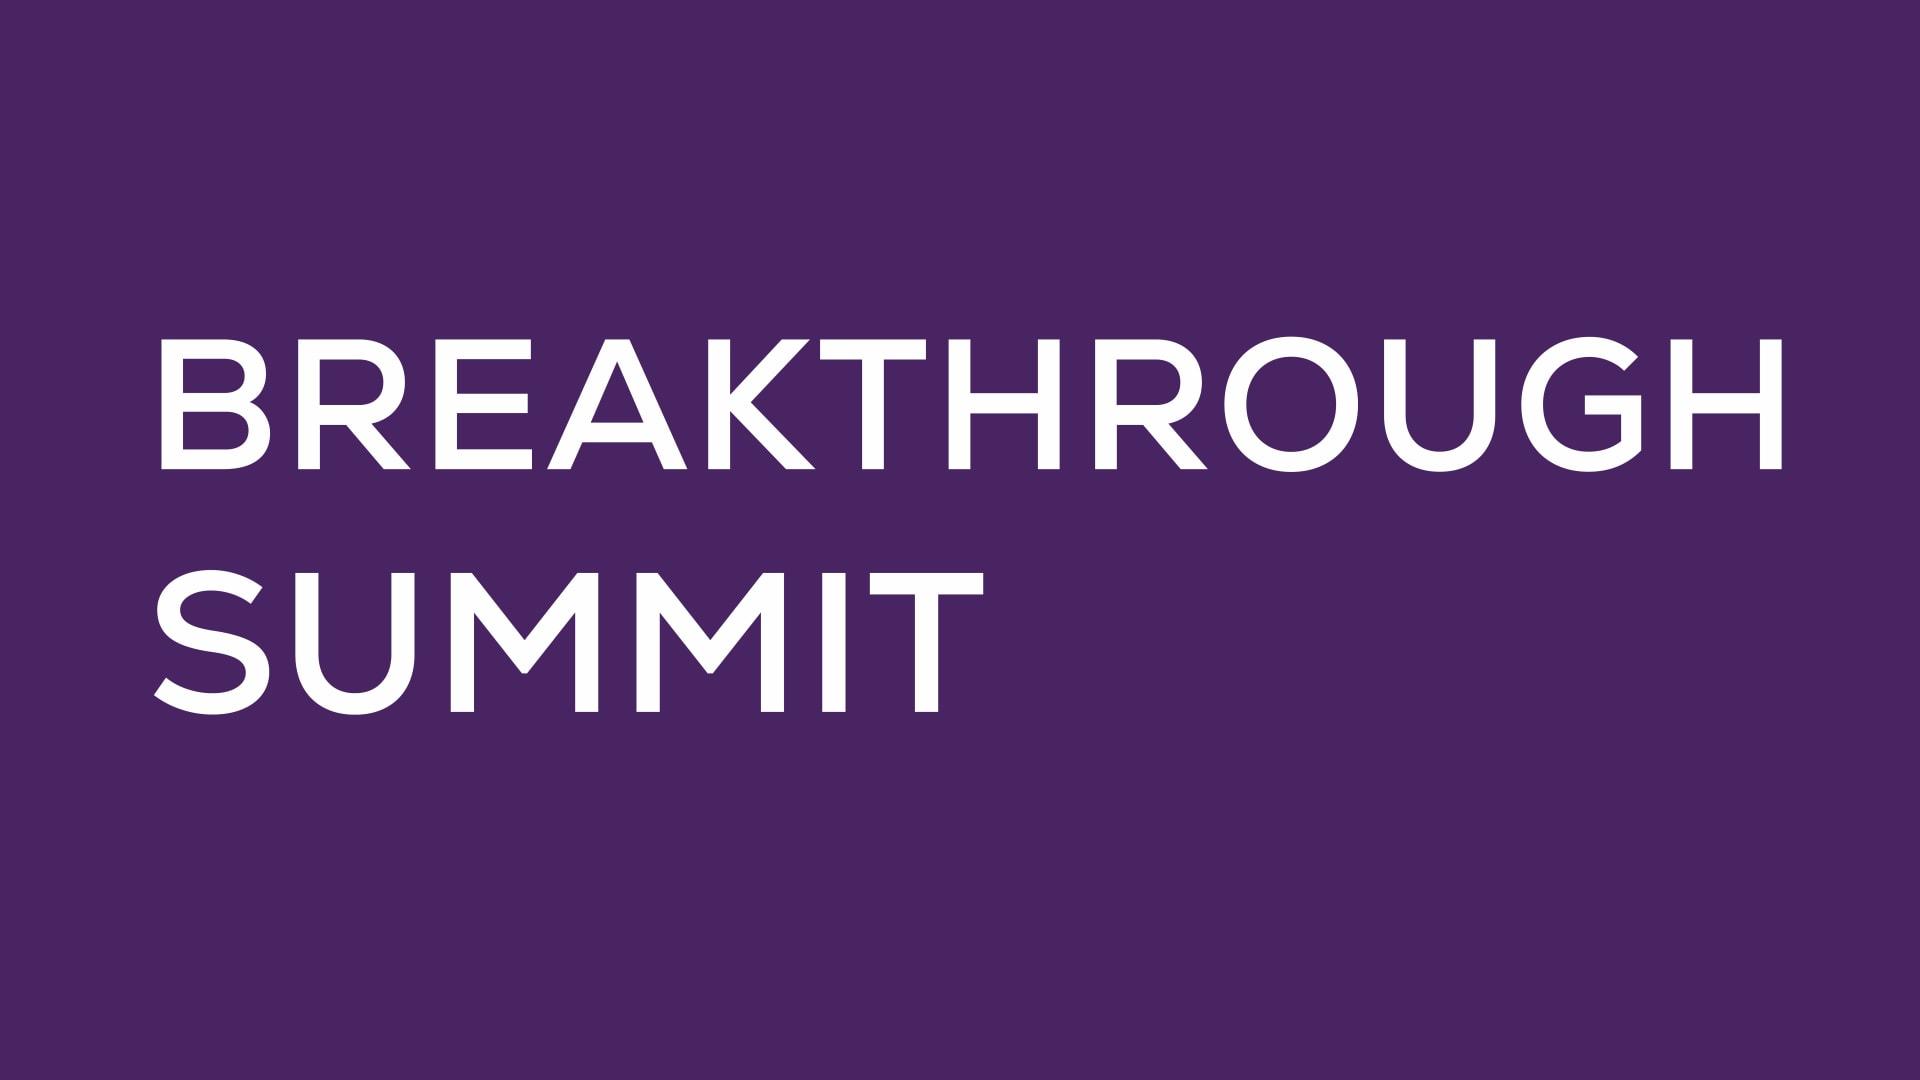 Breakthrough Summit